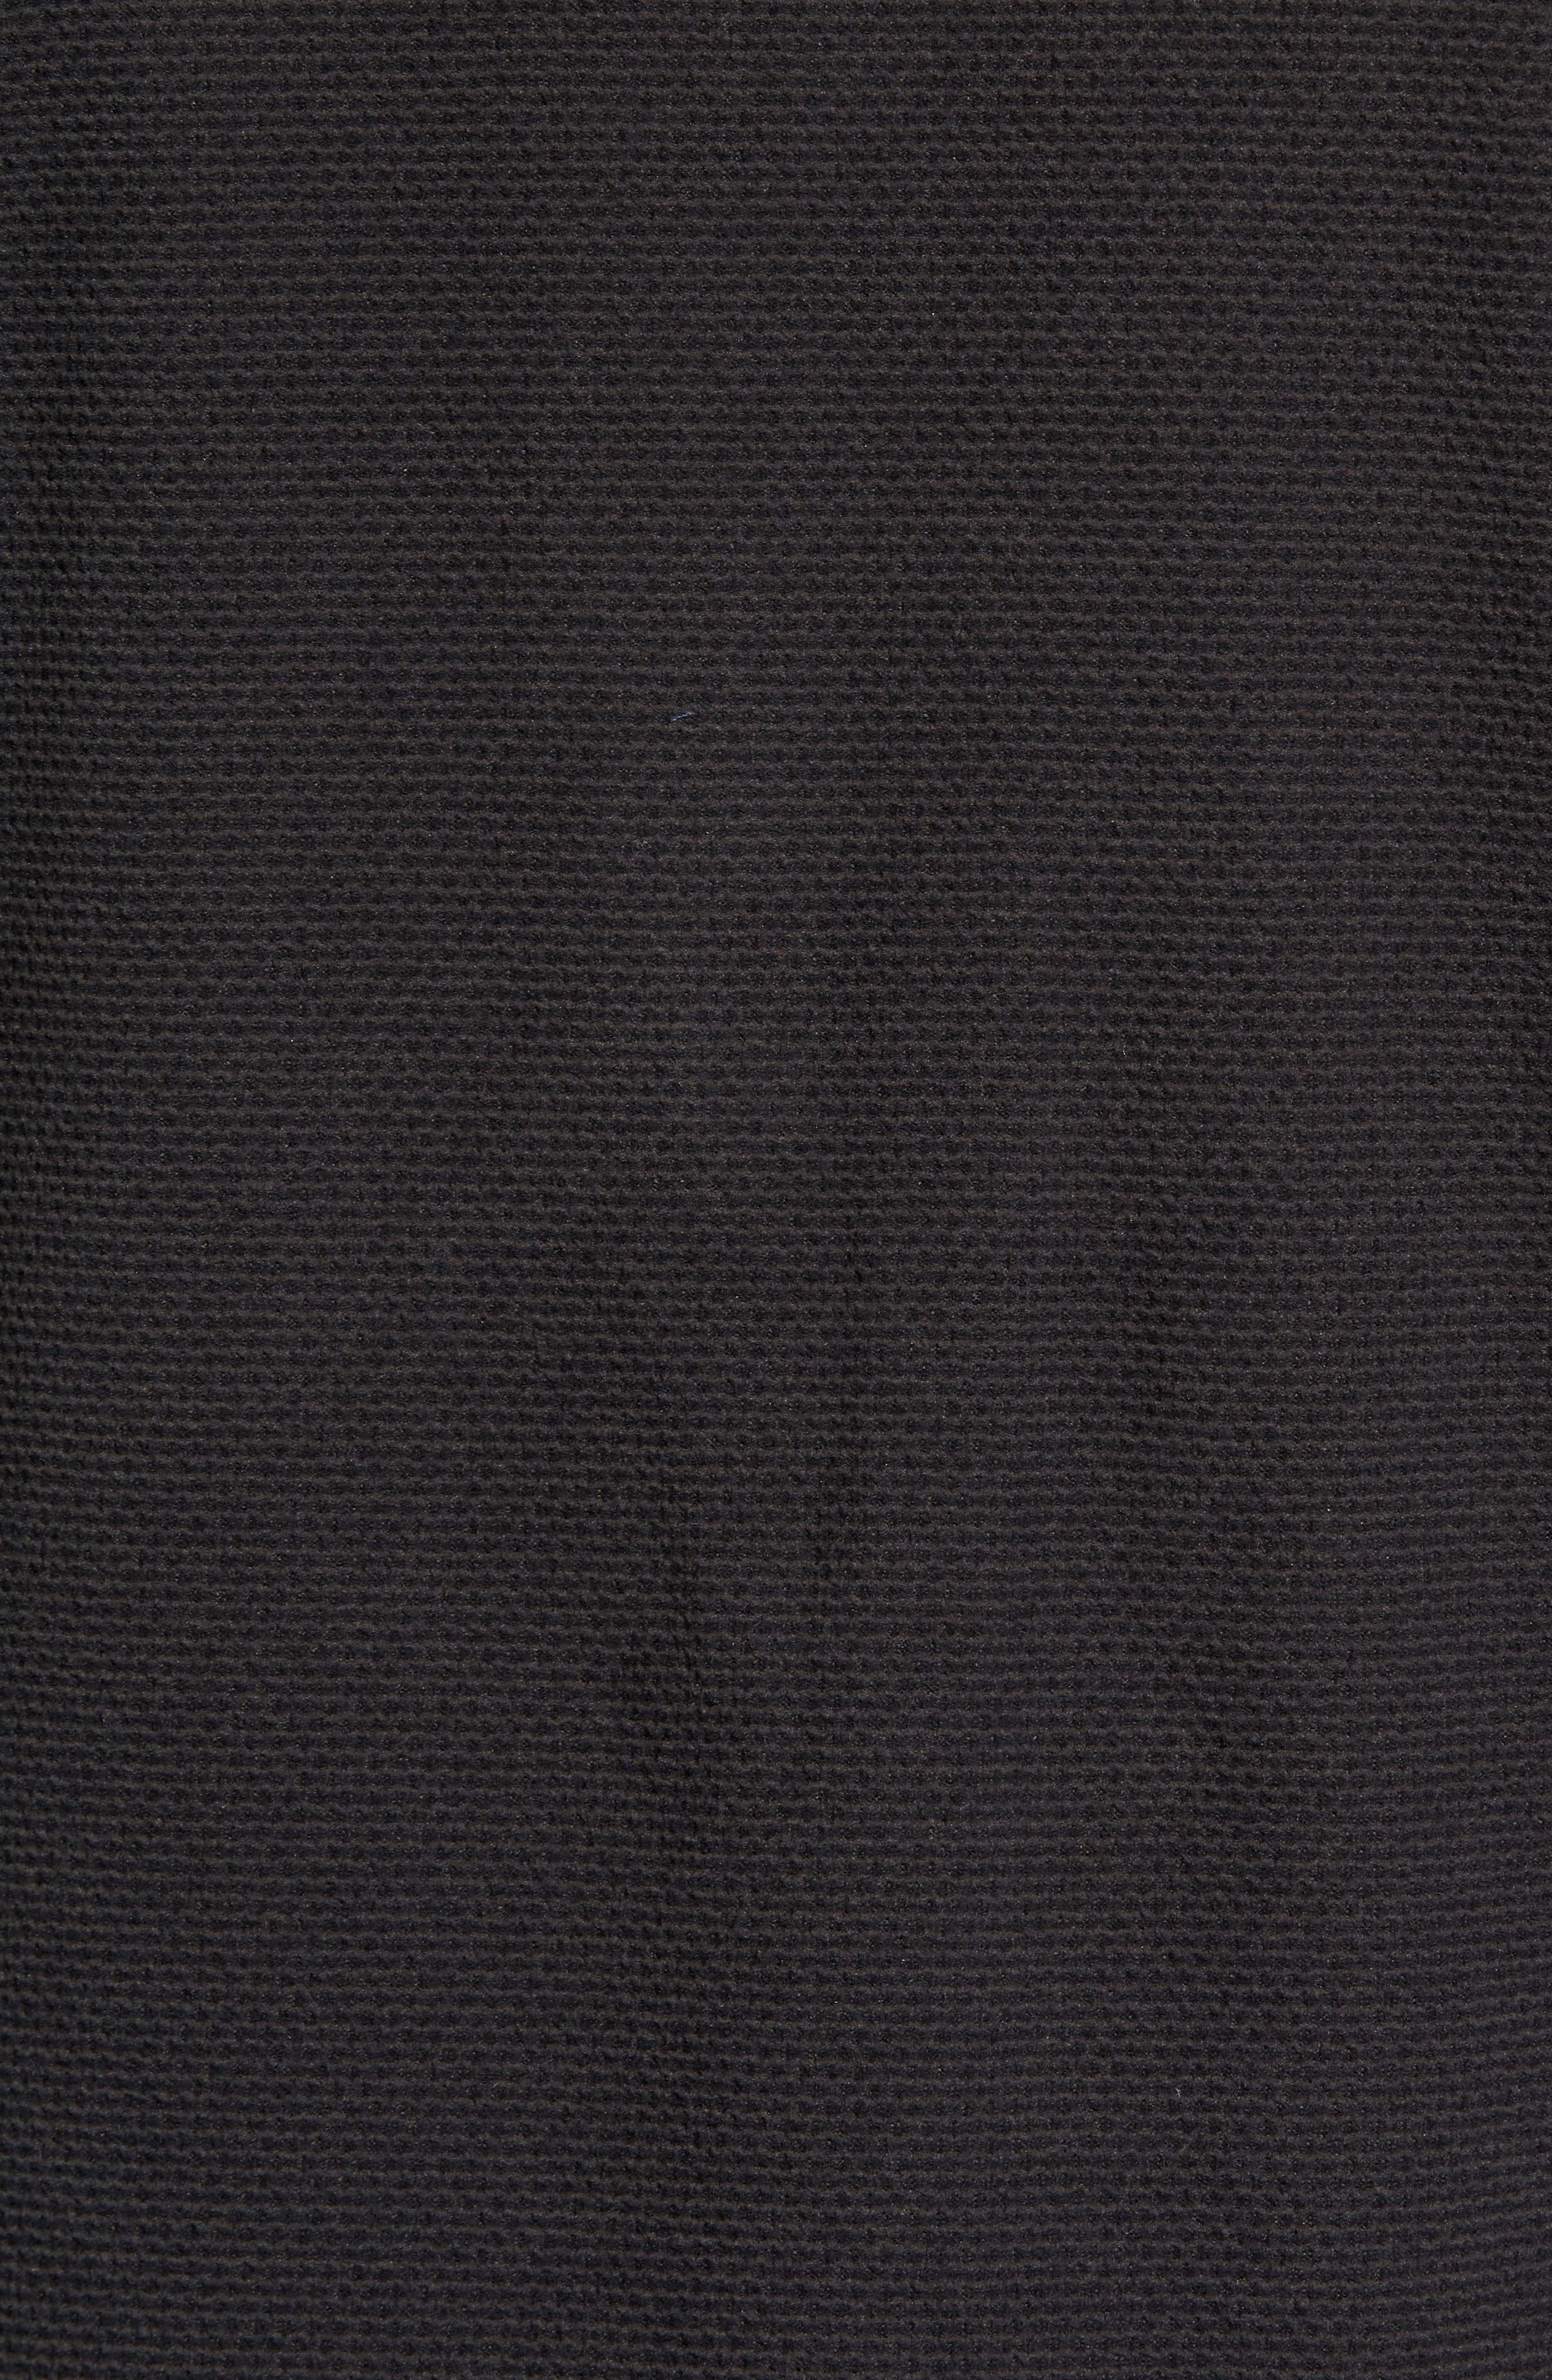 Texture Cap Rock Quarter Zip Fleece Jacket,                             Alternate thumbnail 6, color,                             TNF BLACK